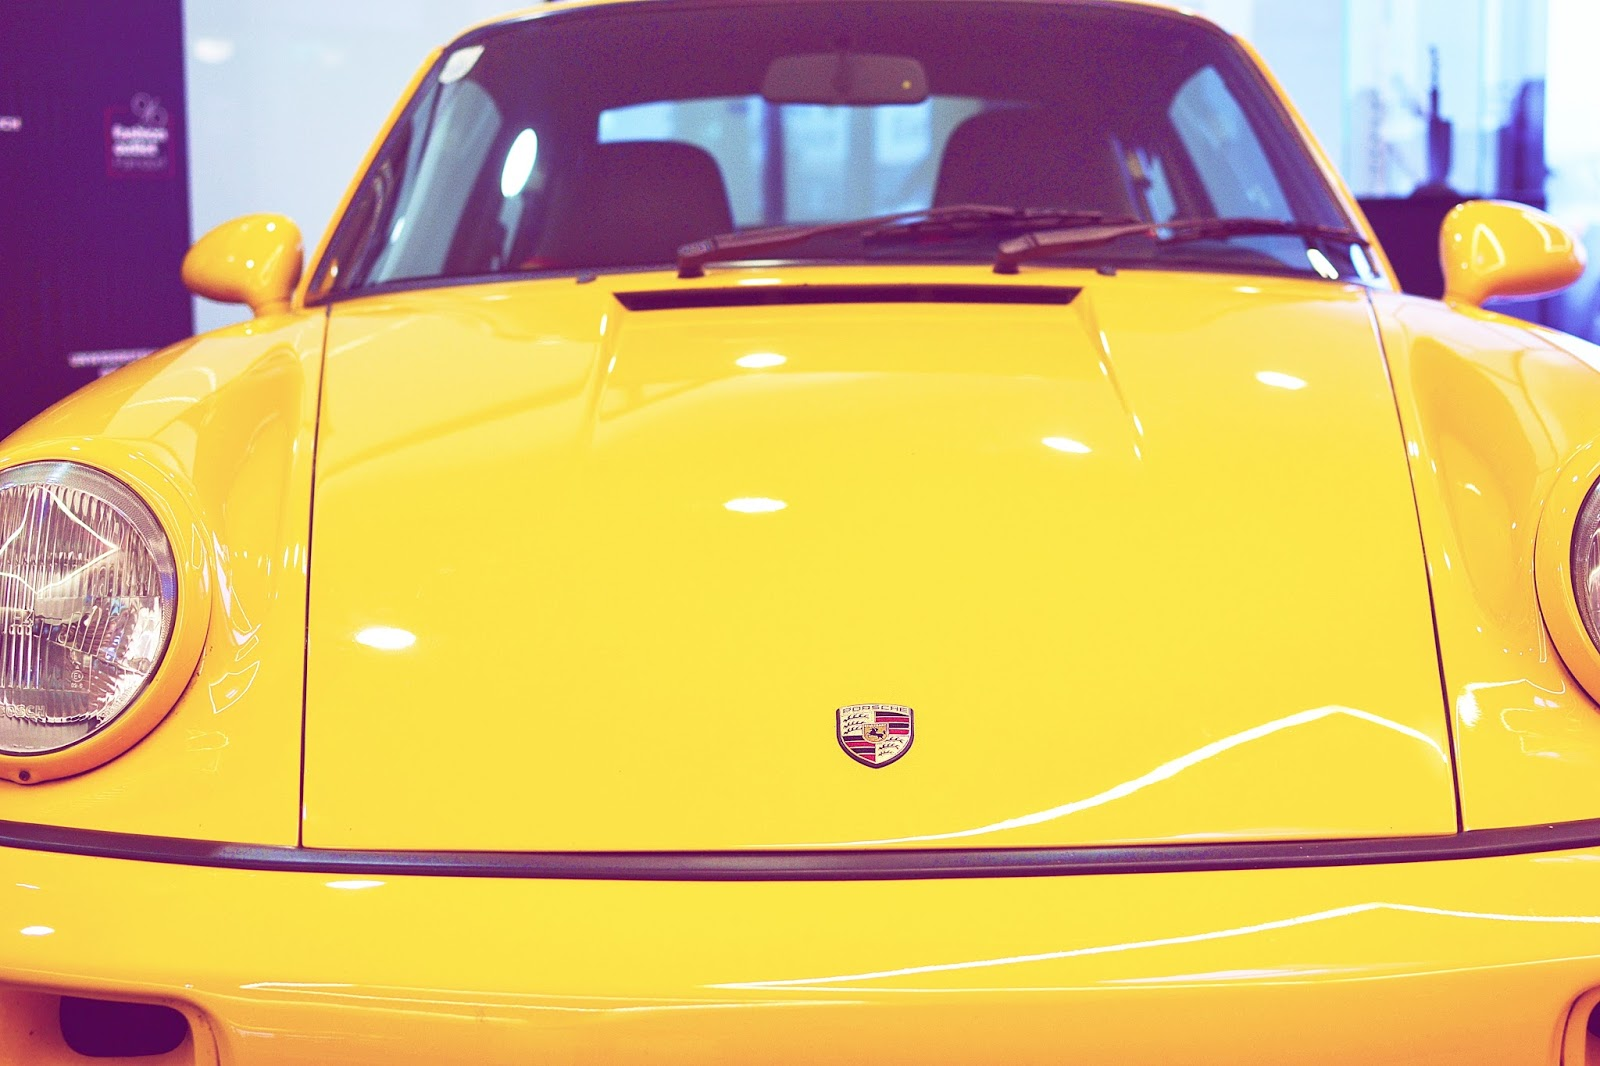 Porsche ako doplnok_Katharíne-fashion is beautiful_Katarína Jakubčová_fashion blogger